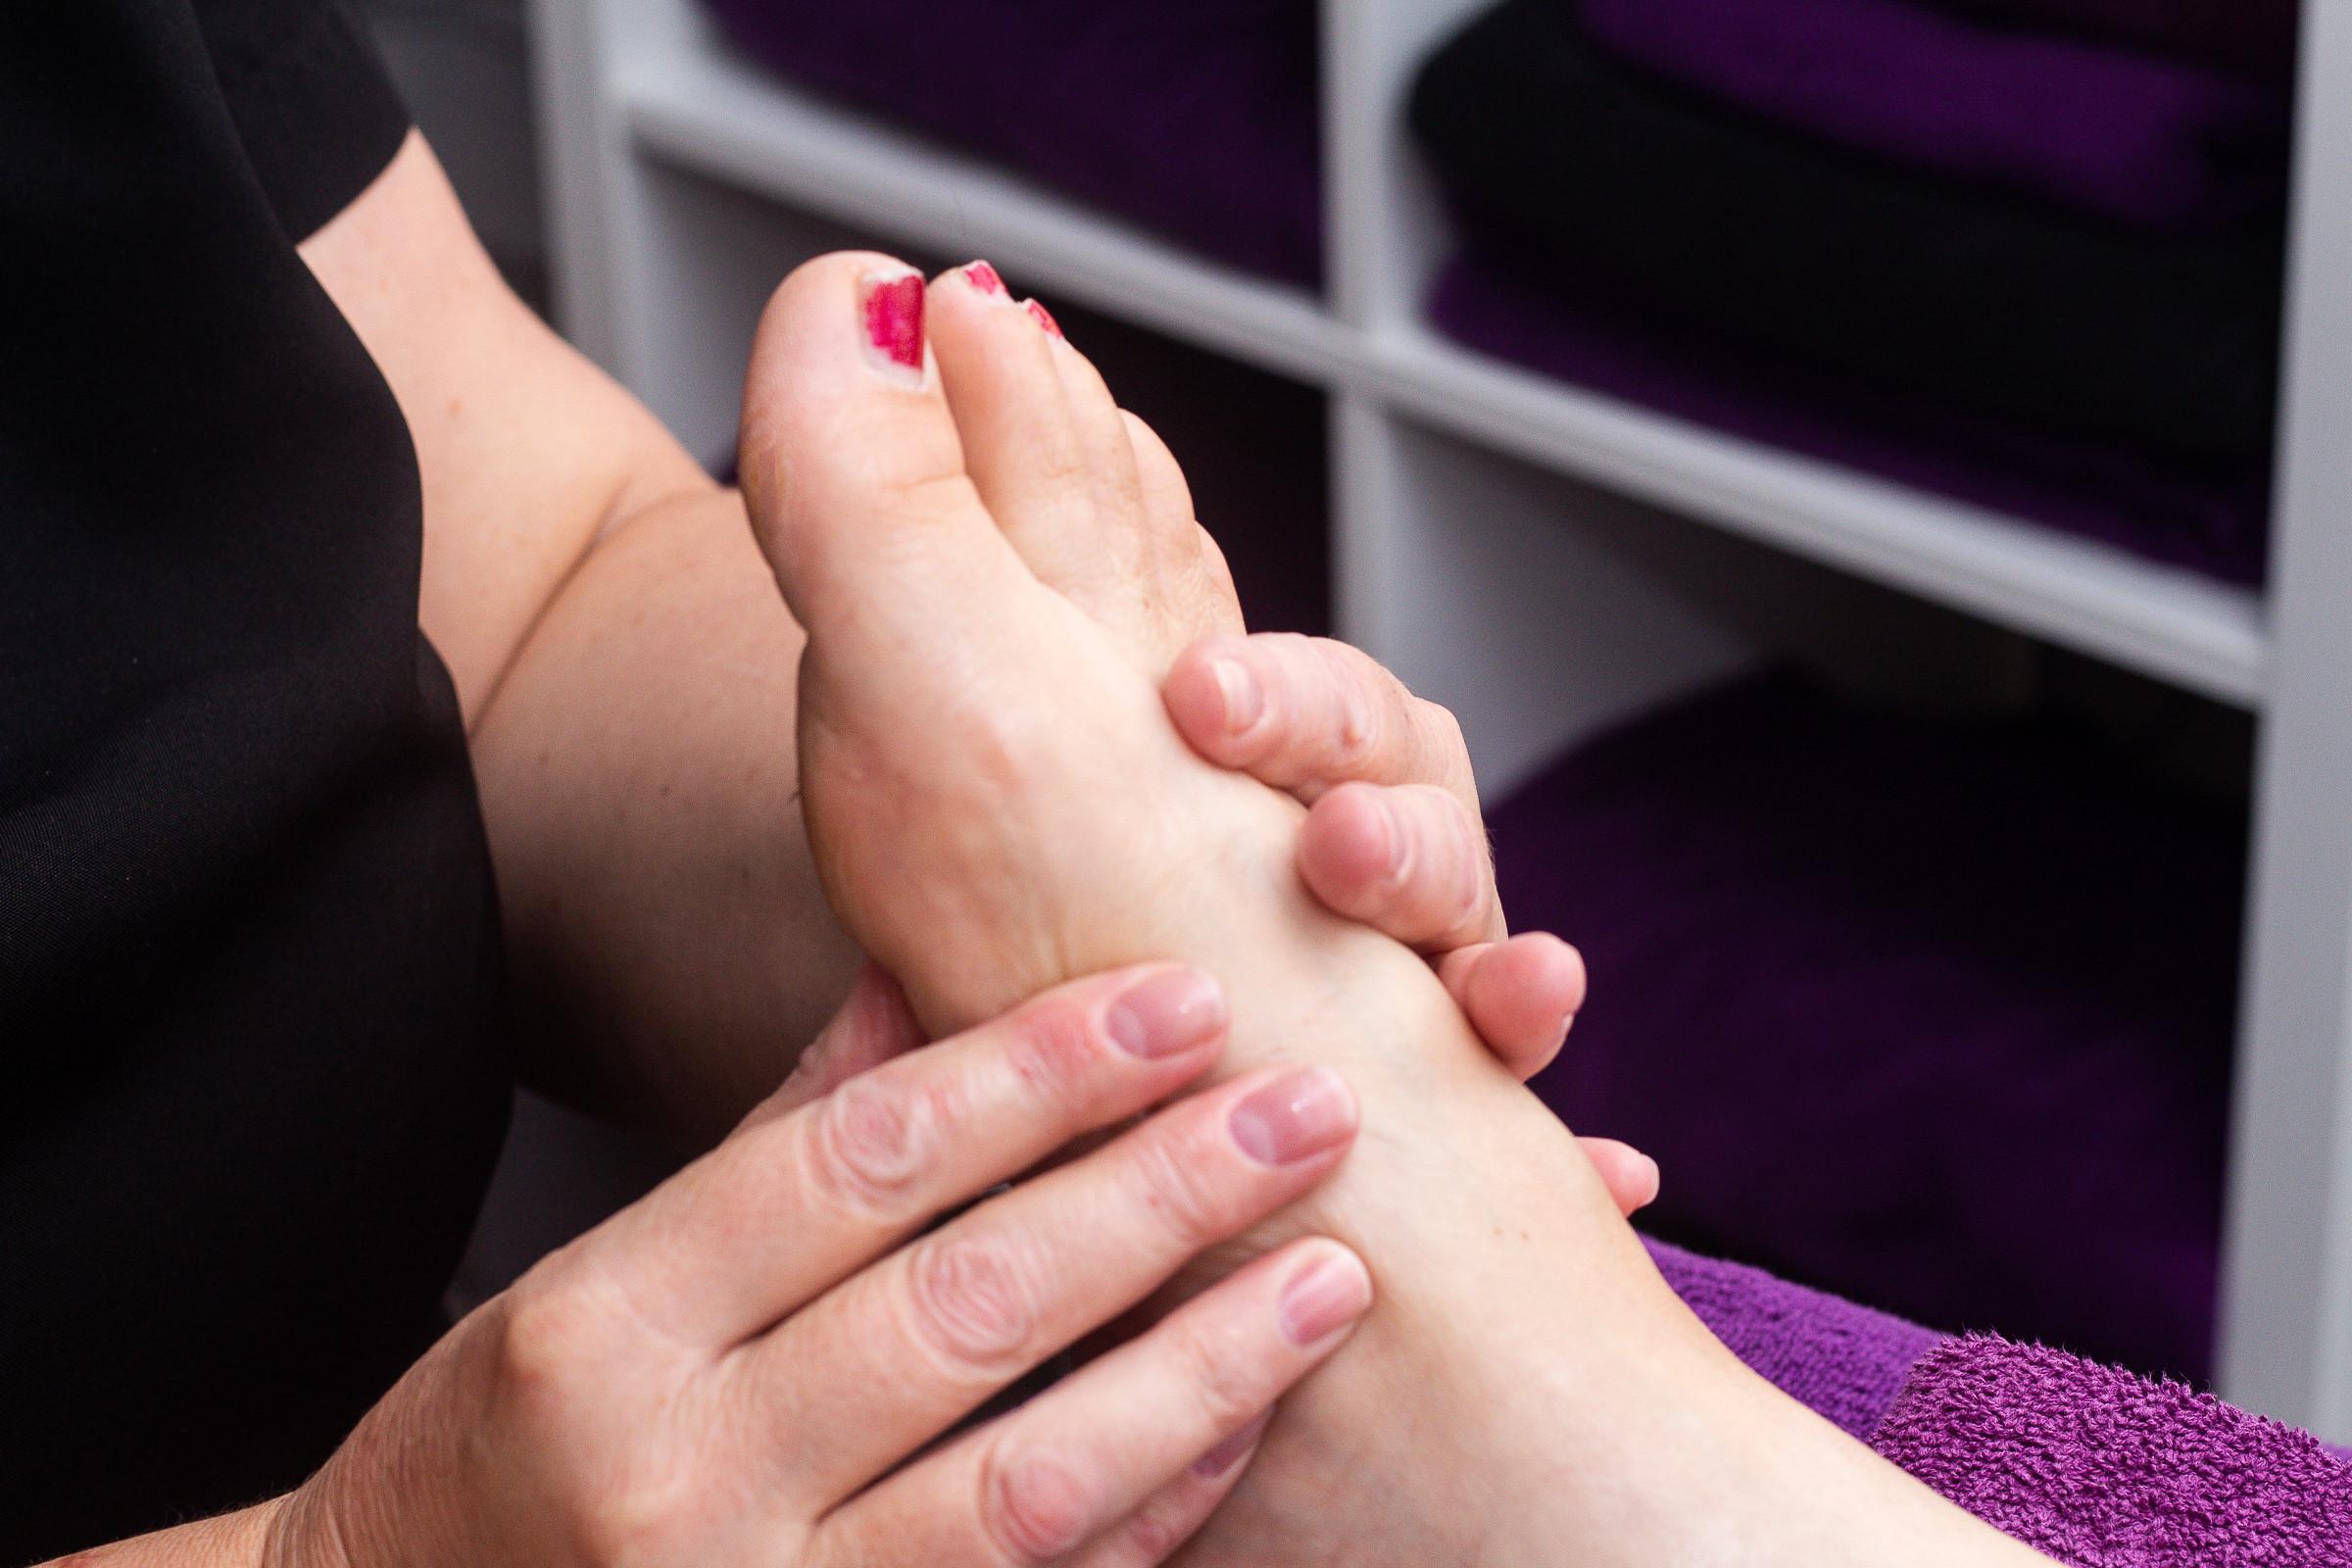 Reflexology with back massage